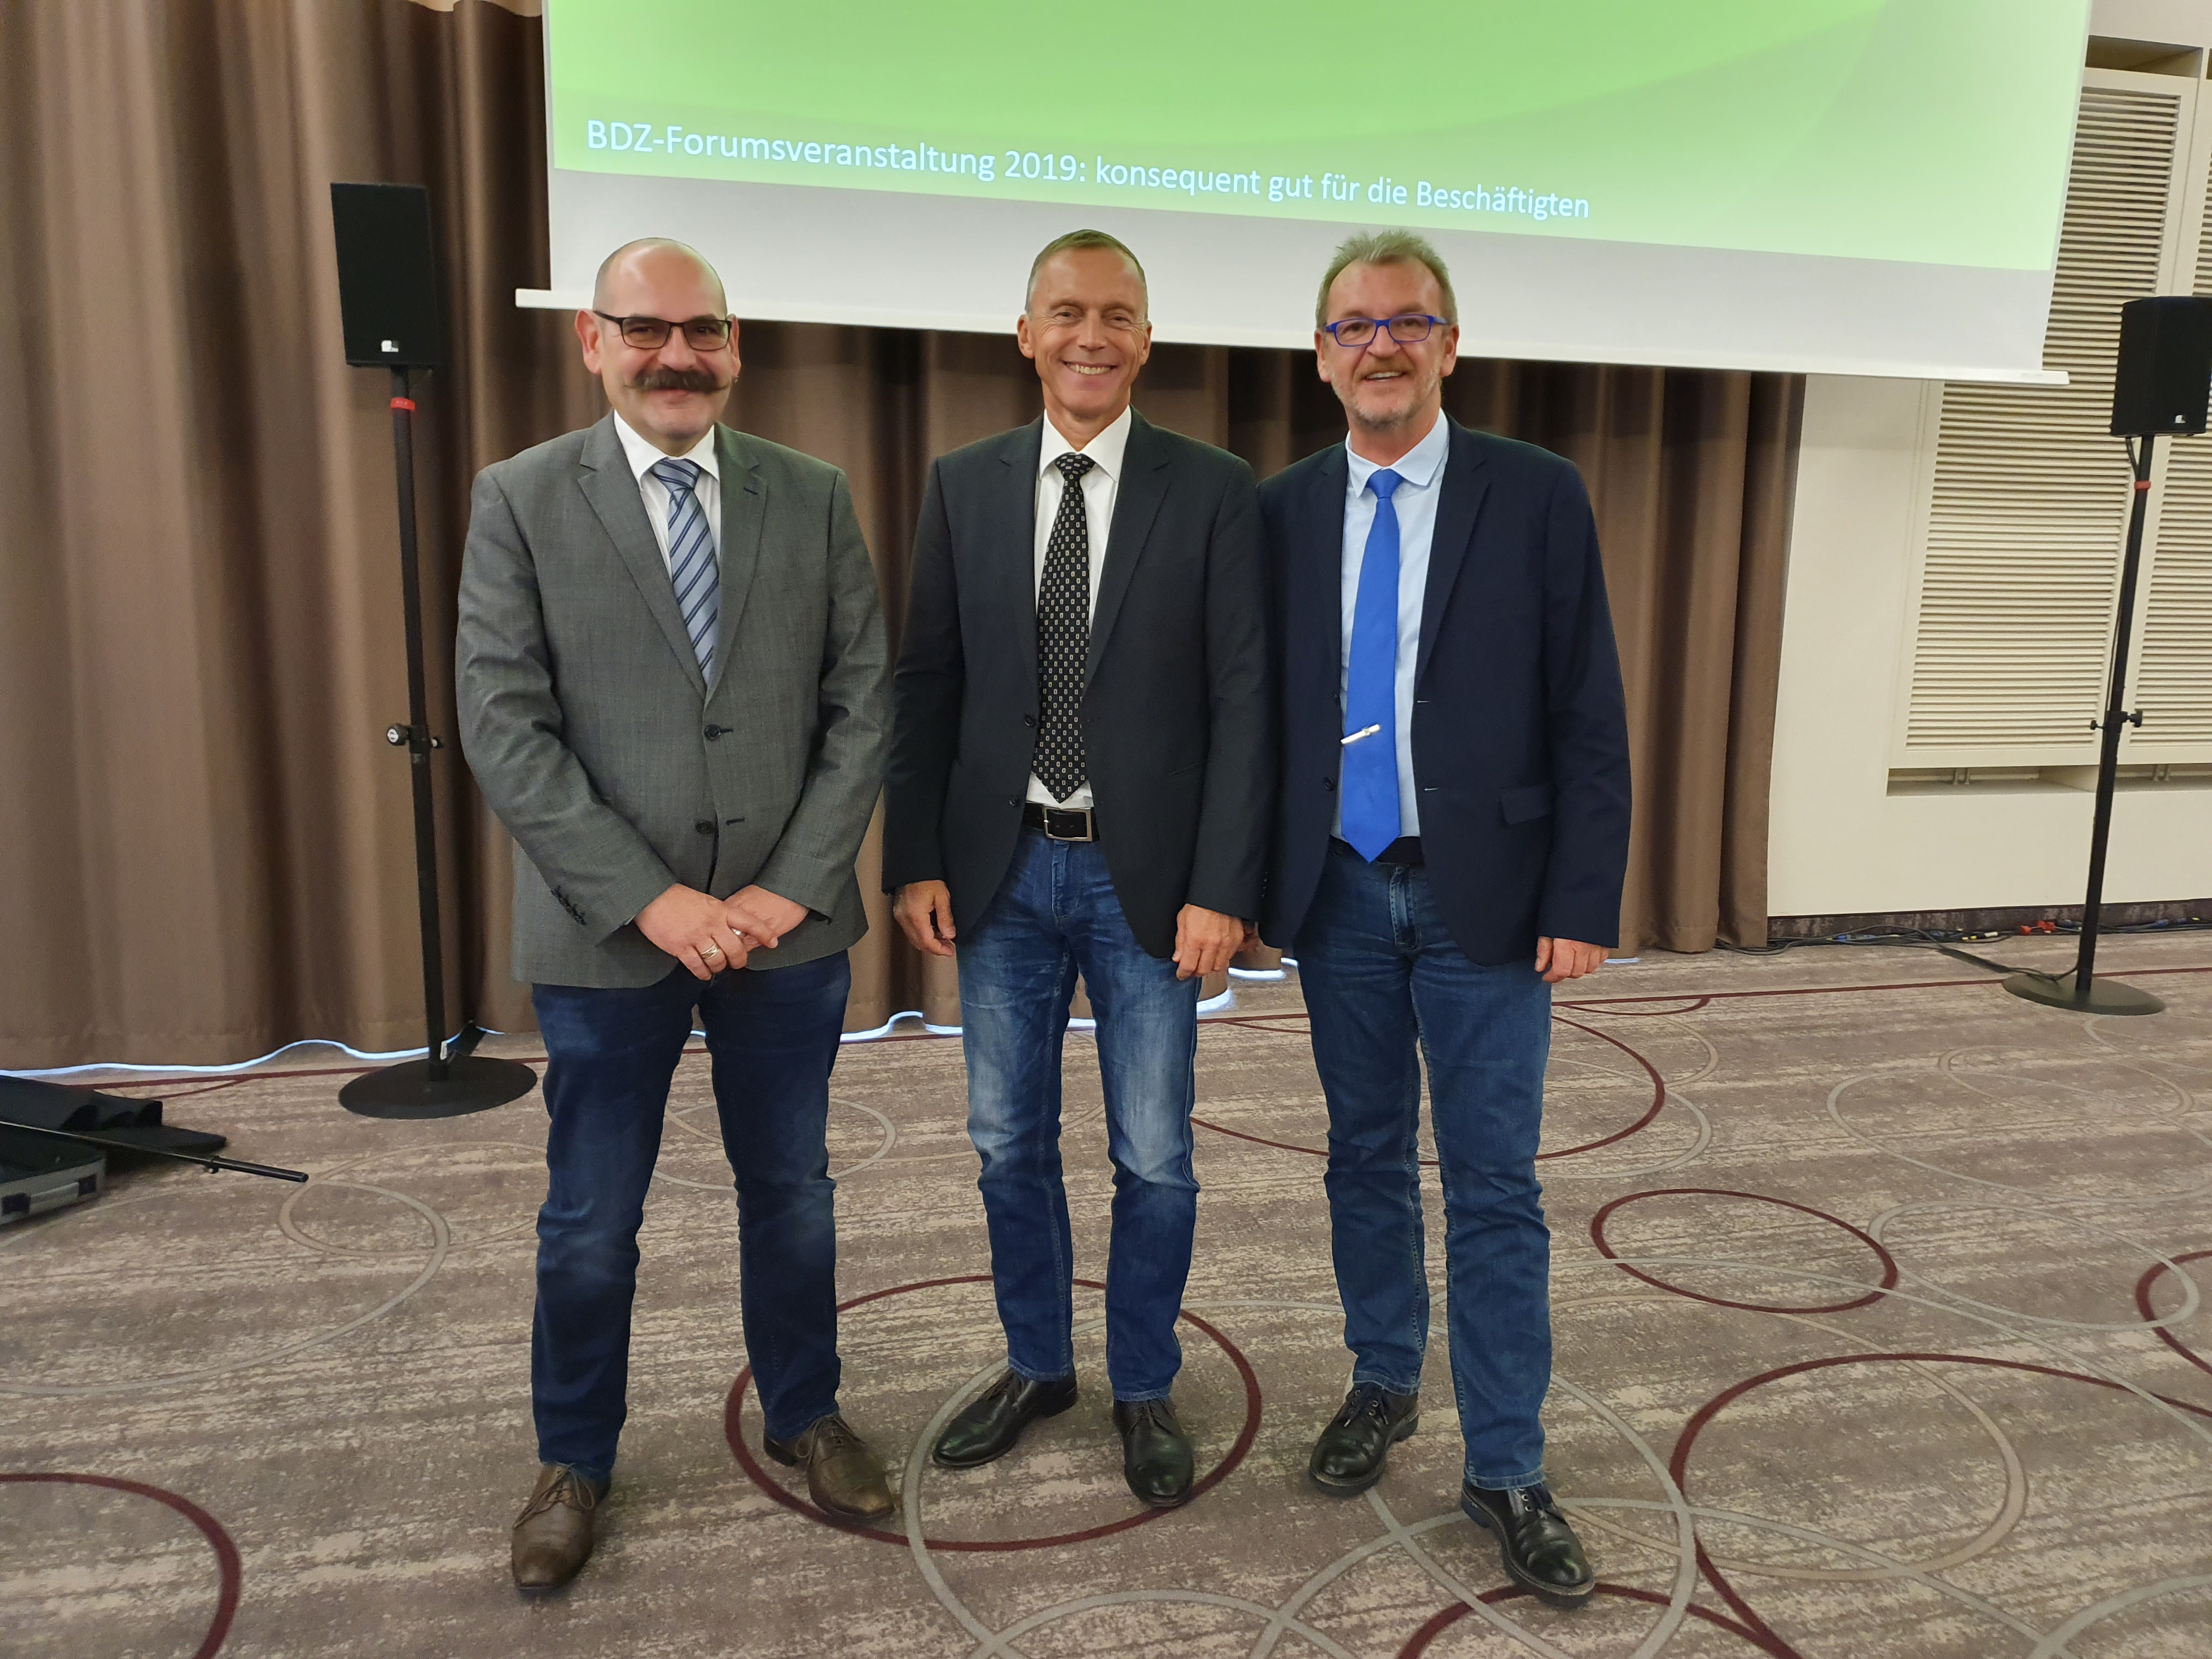 BDZ-Forumsveranstaltung 2019